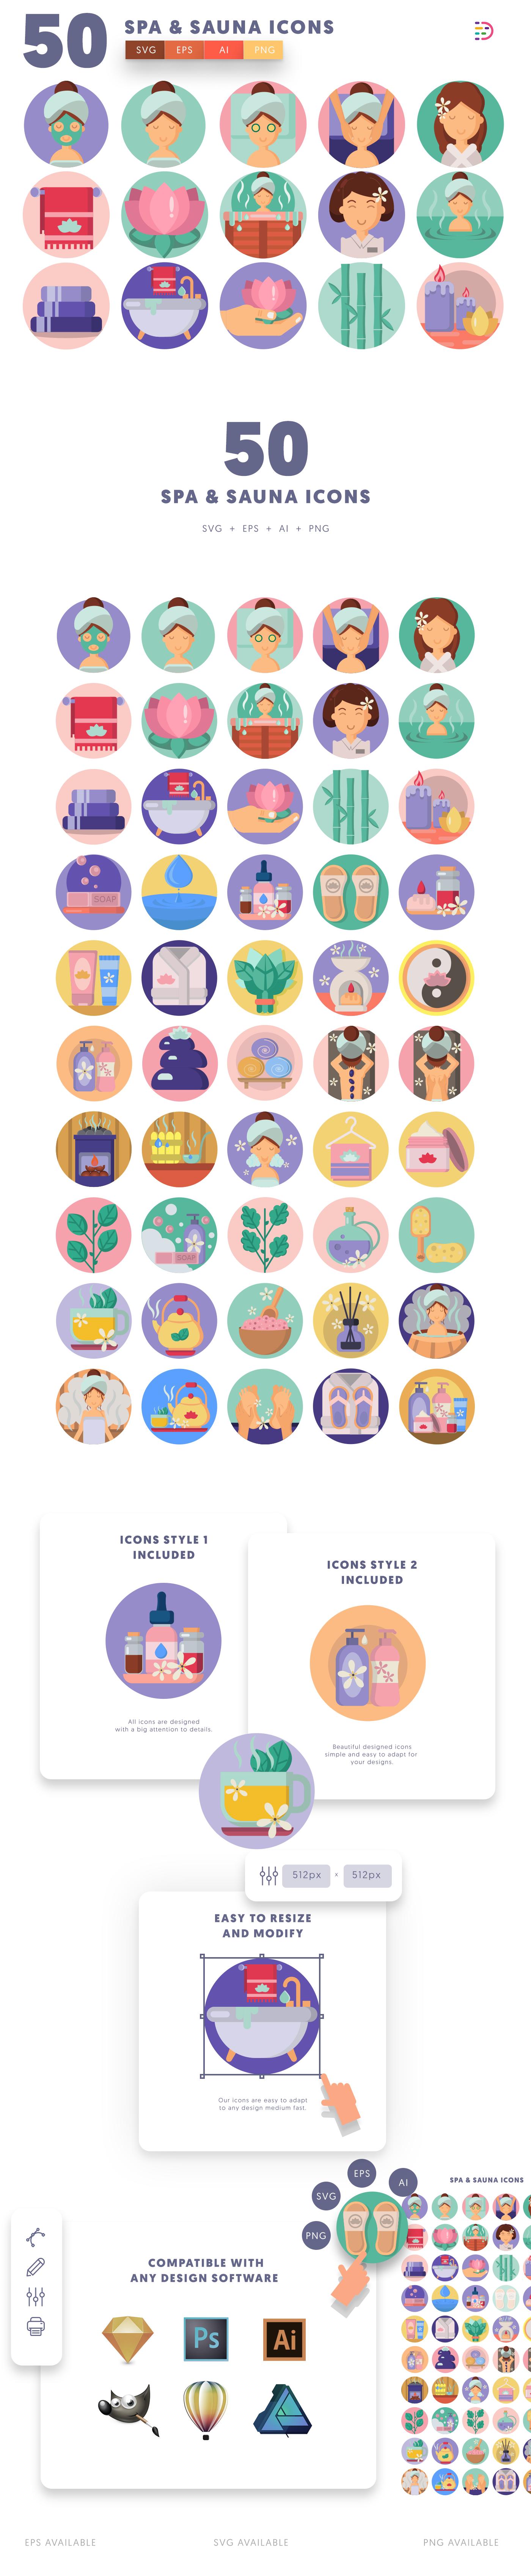 50 Spa and Sauna Icons list